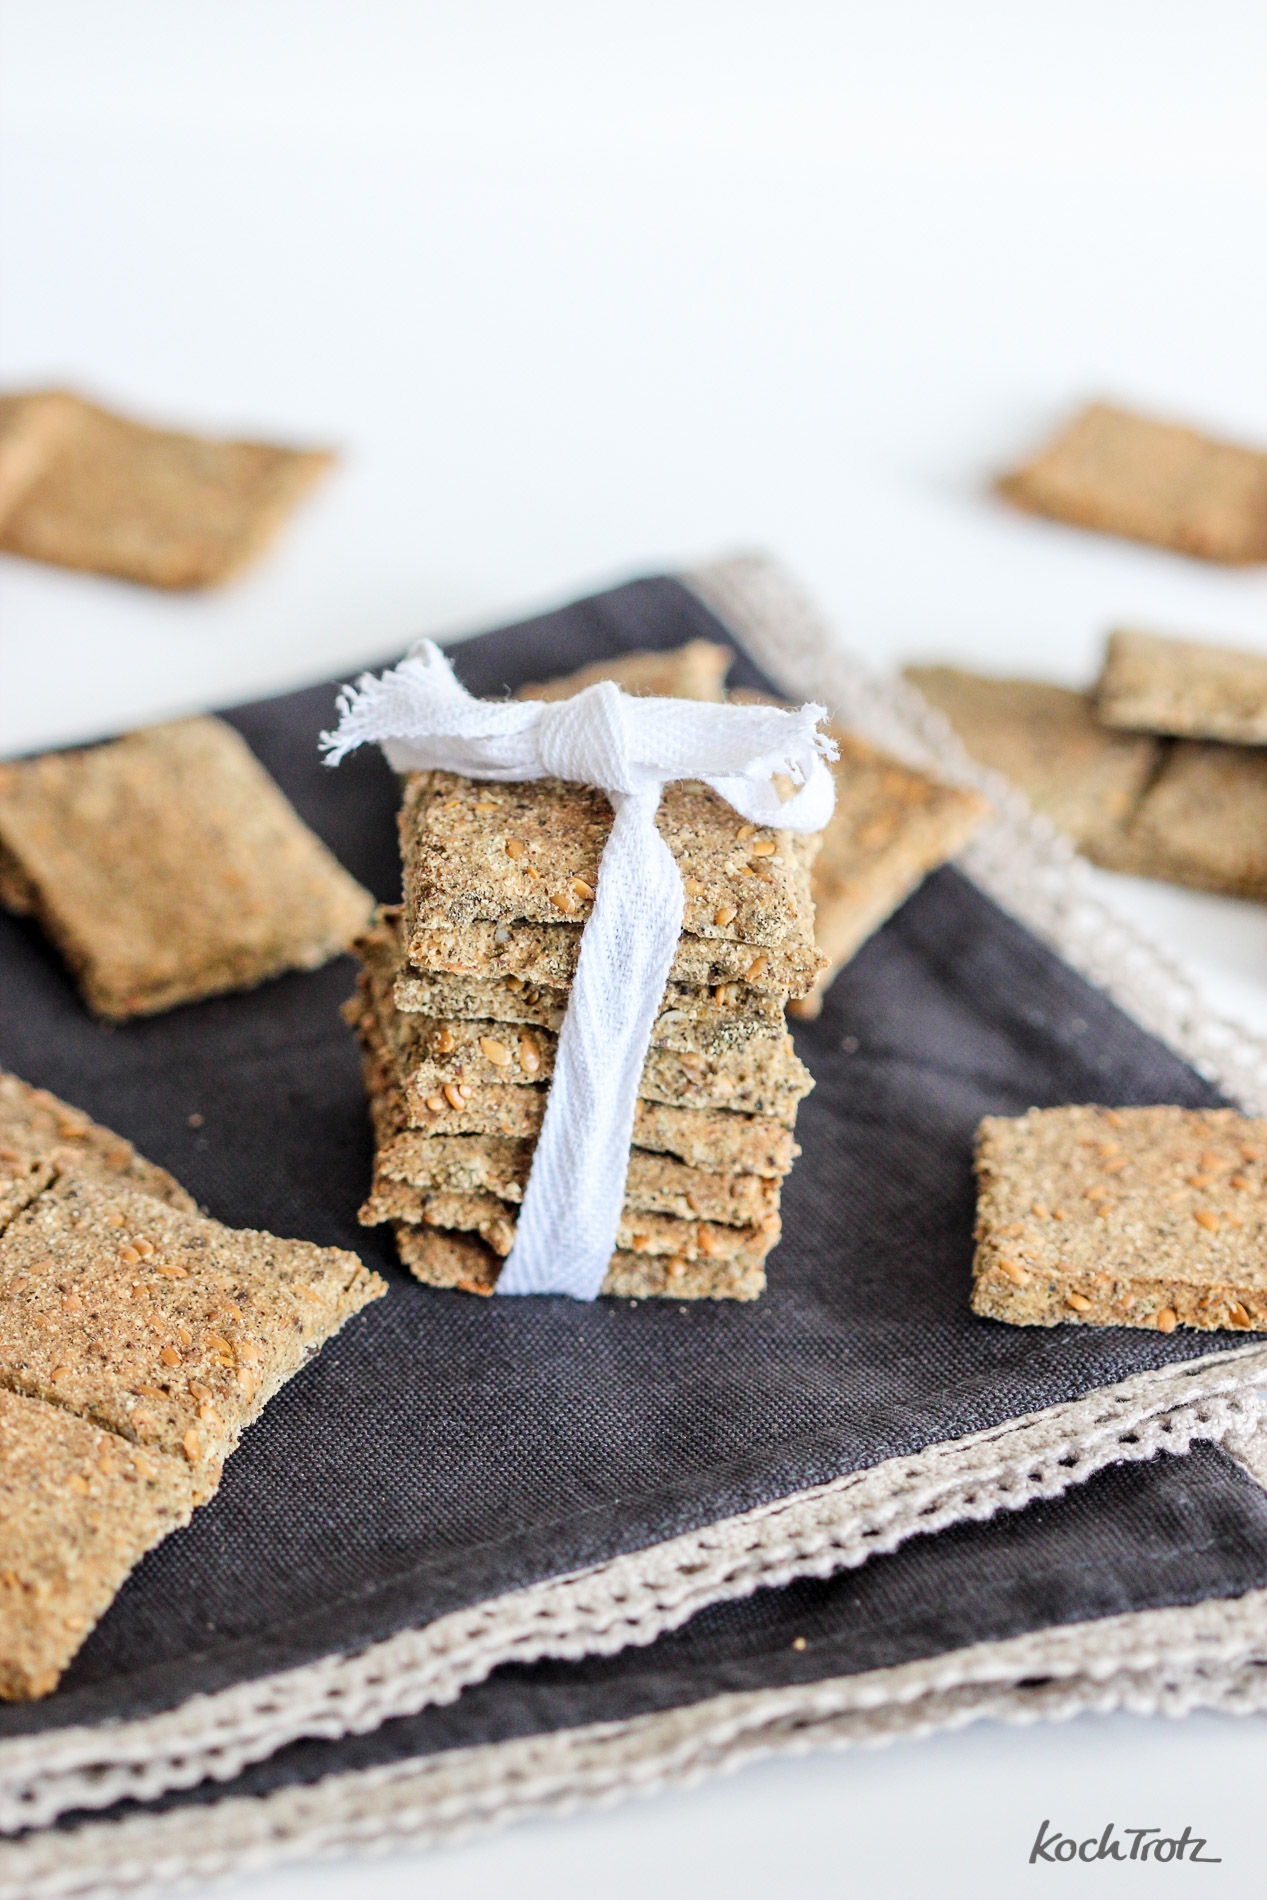 life-changing-cracker-glutenfrei-vegan-fructosearm-nussfrei-1-9